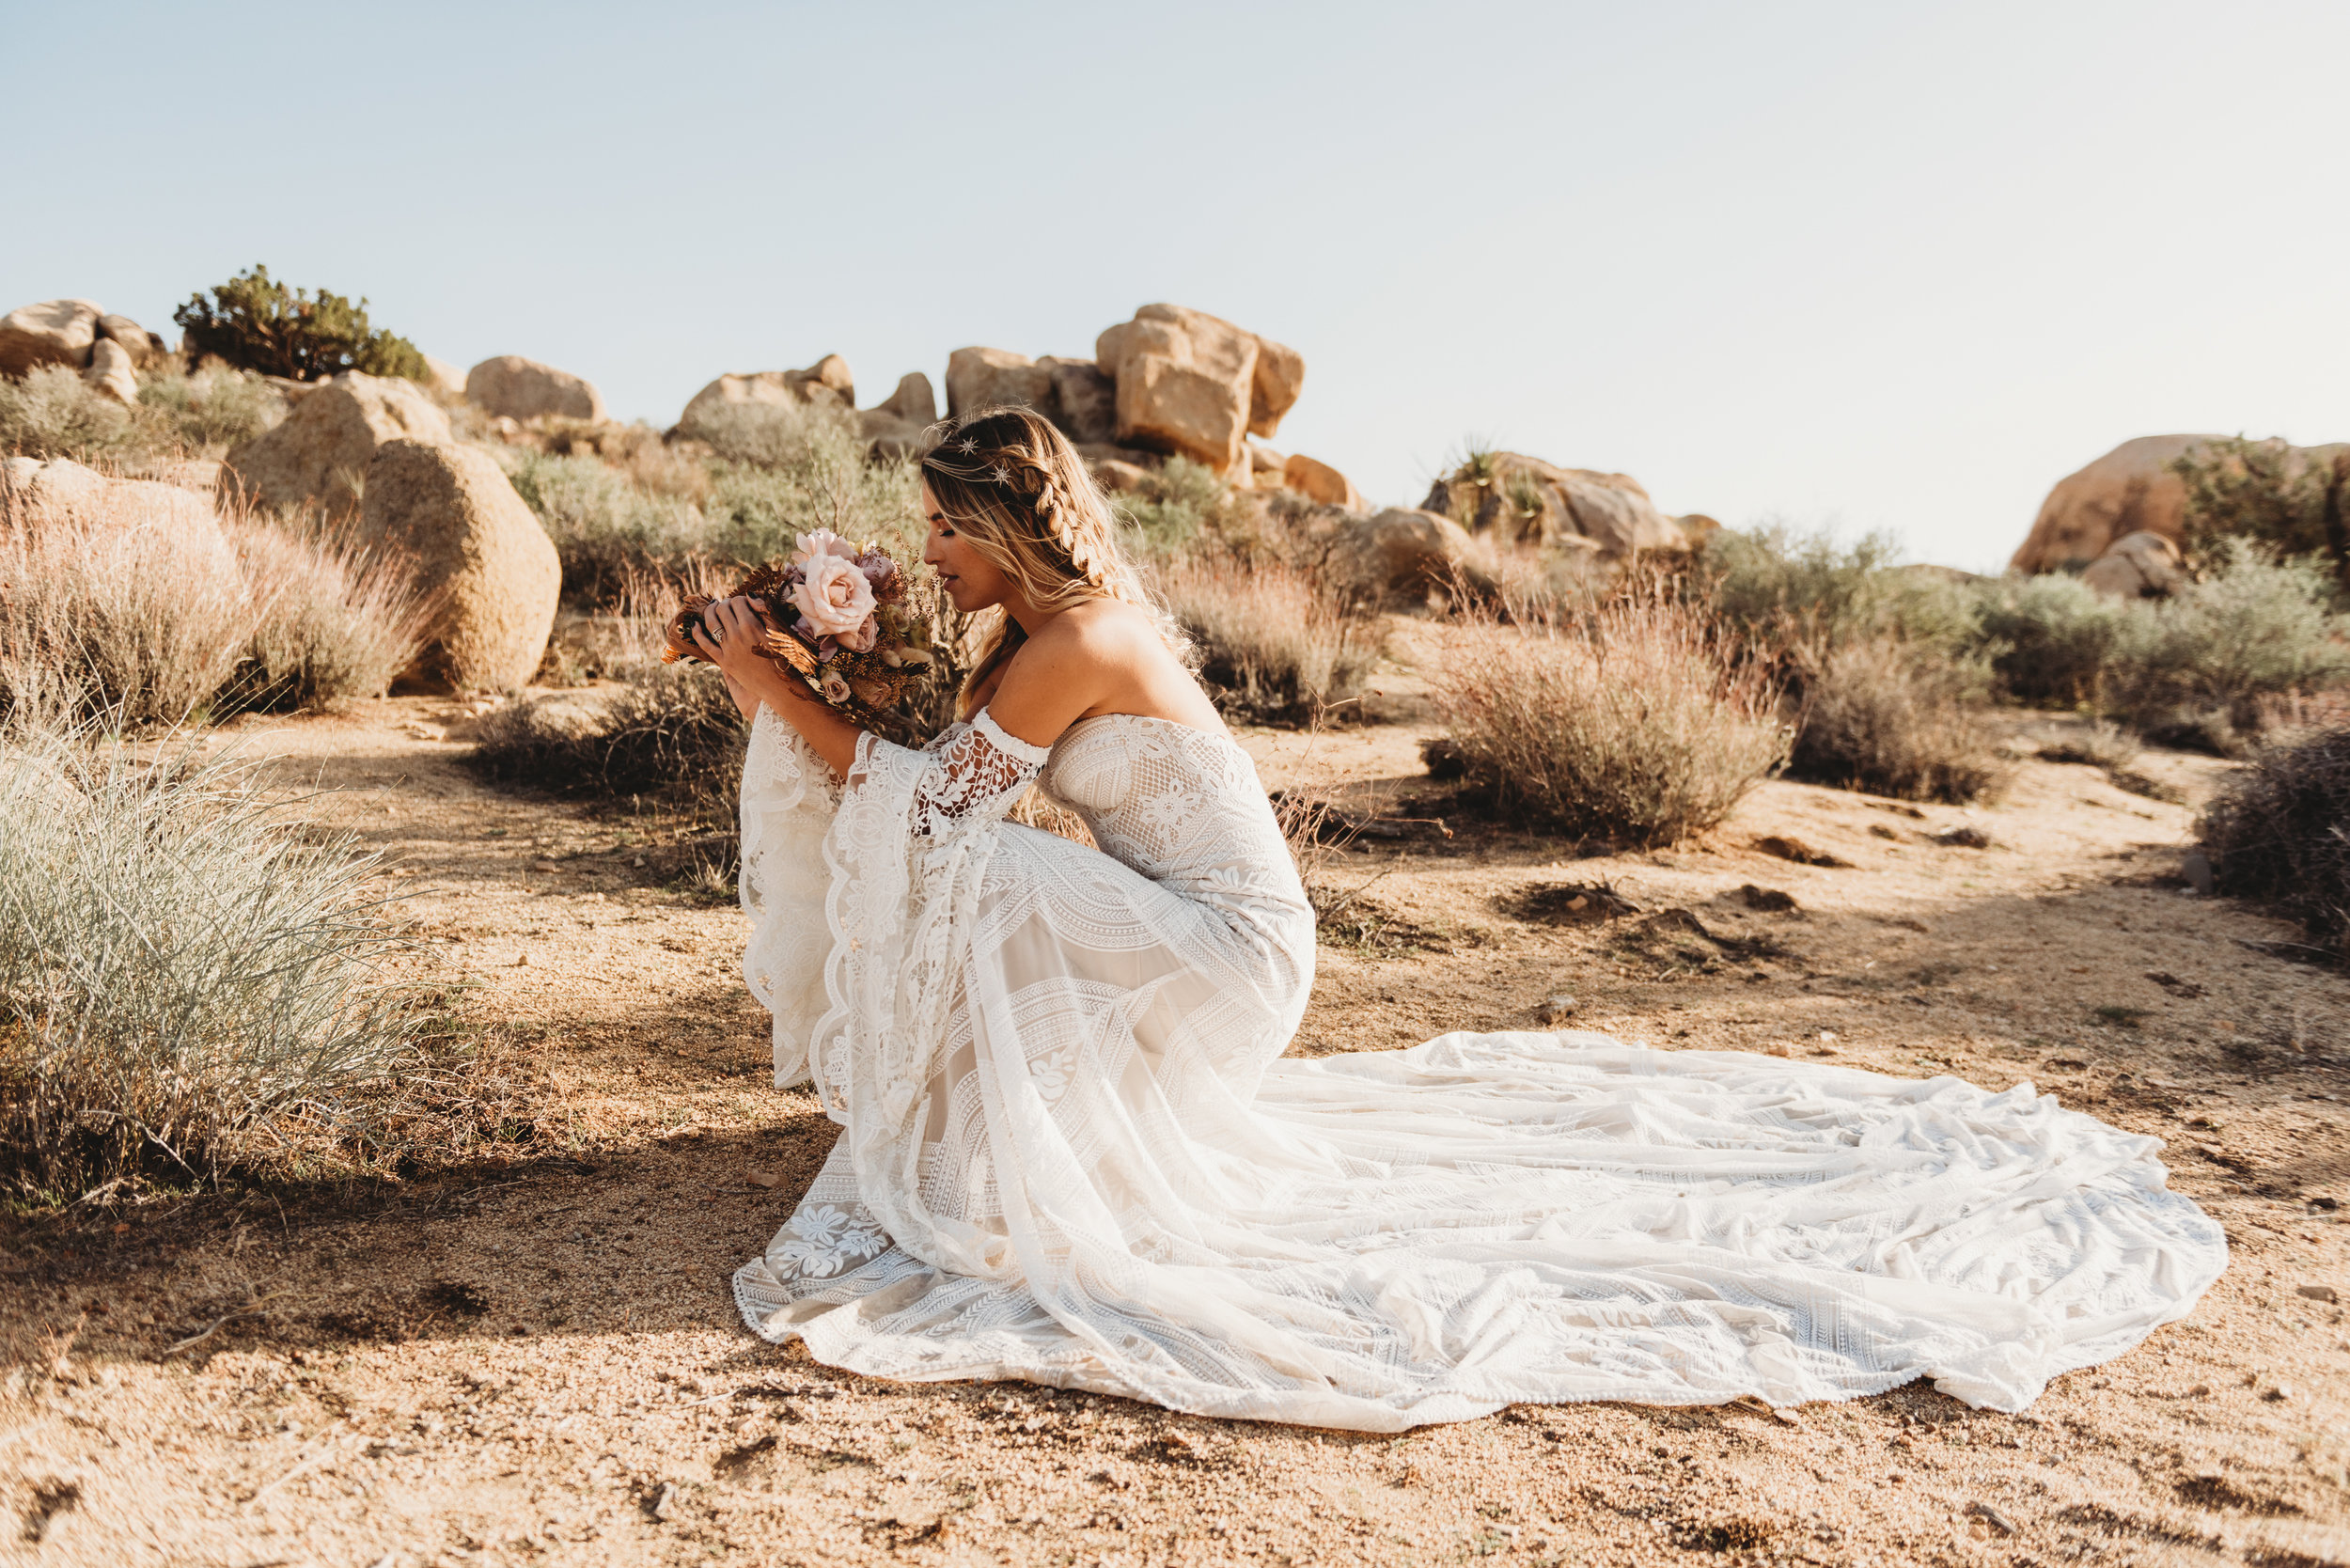 FortSt.John_photographer_TyraEPhotography_Wedding_Couple_Family_Photograhy_DawsonCreek_Elopement_Bride_Boduoir_Portraits-4983.jpg